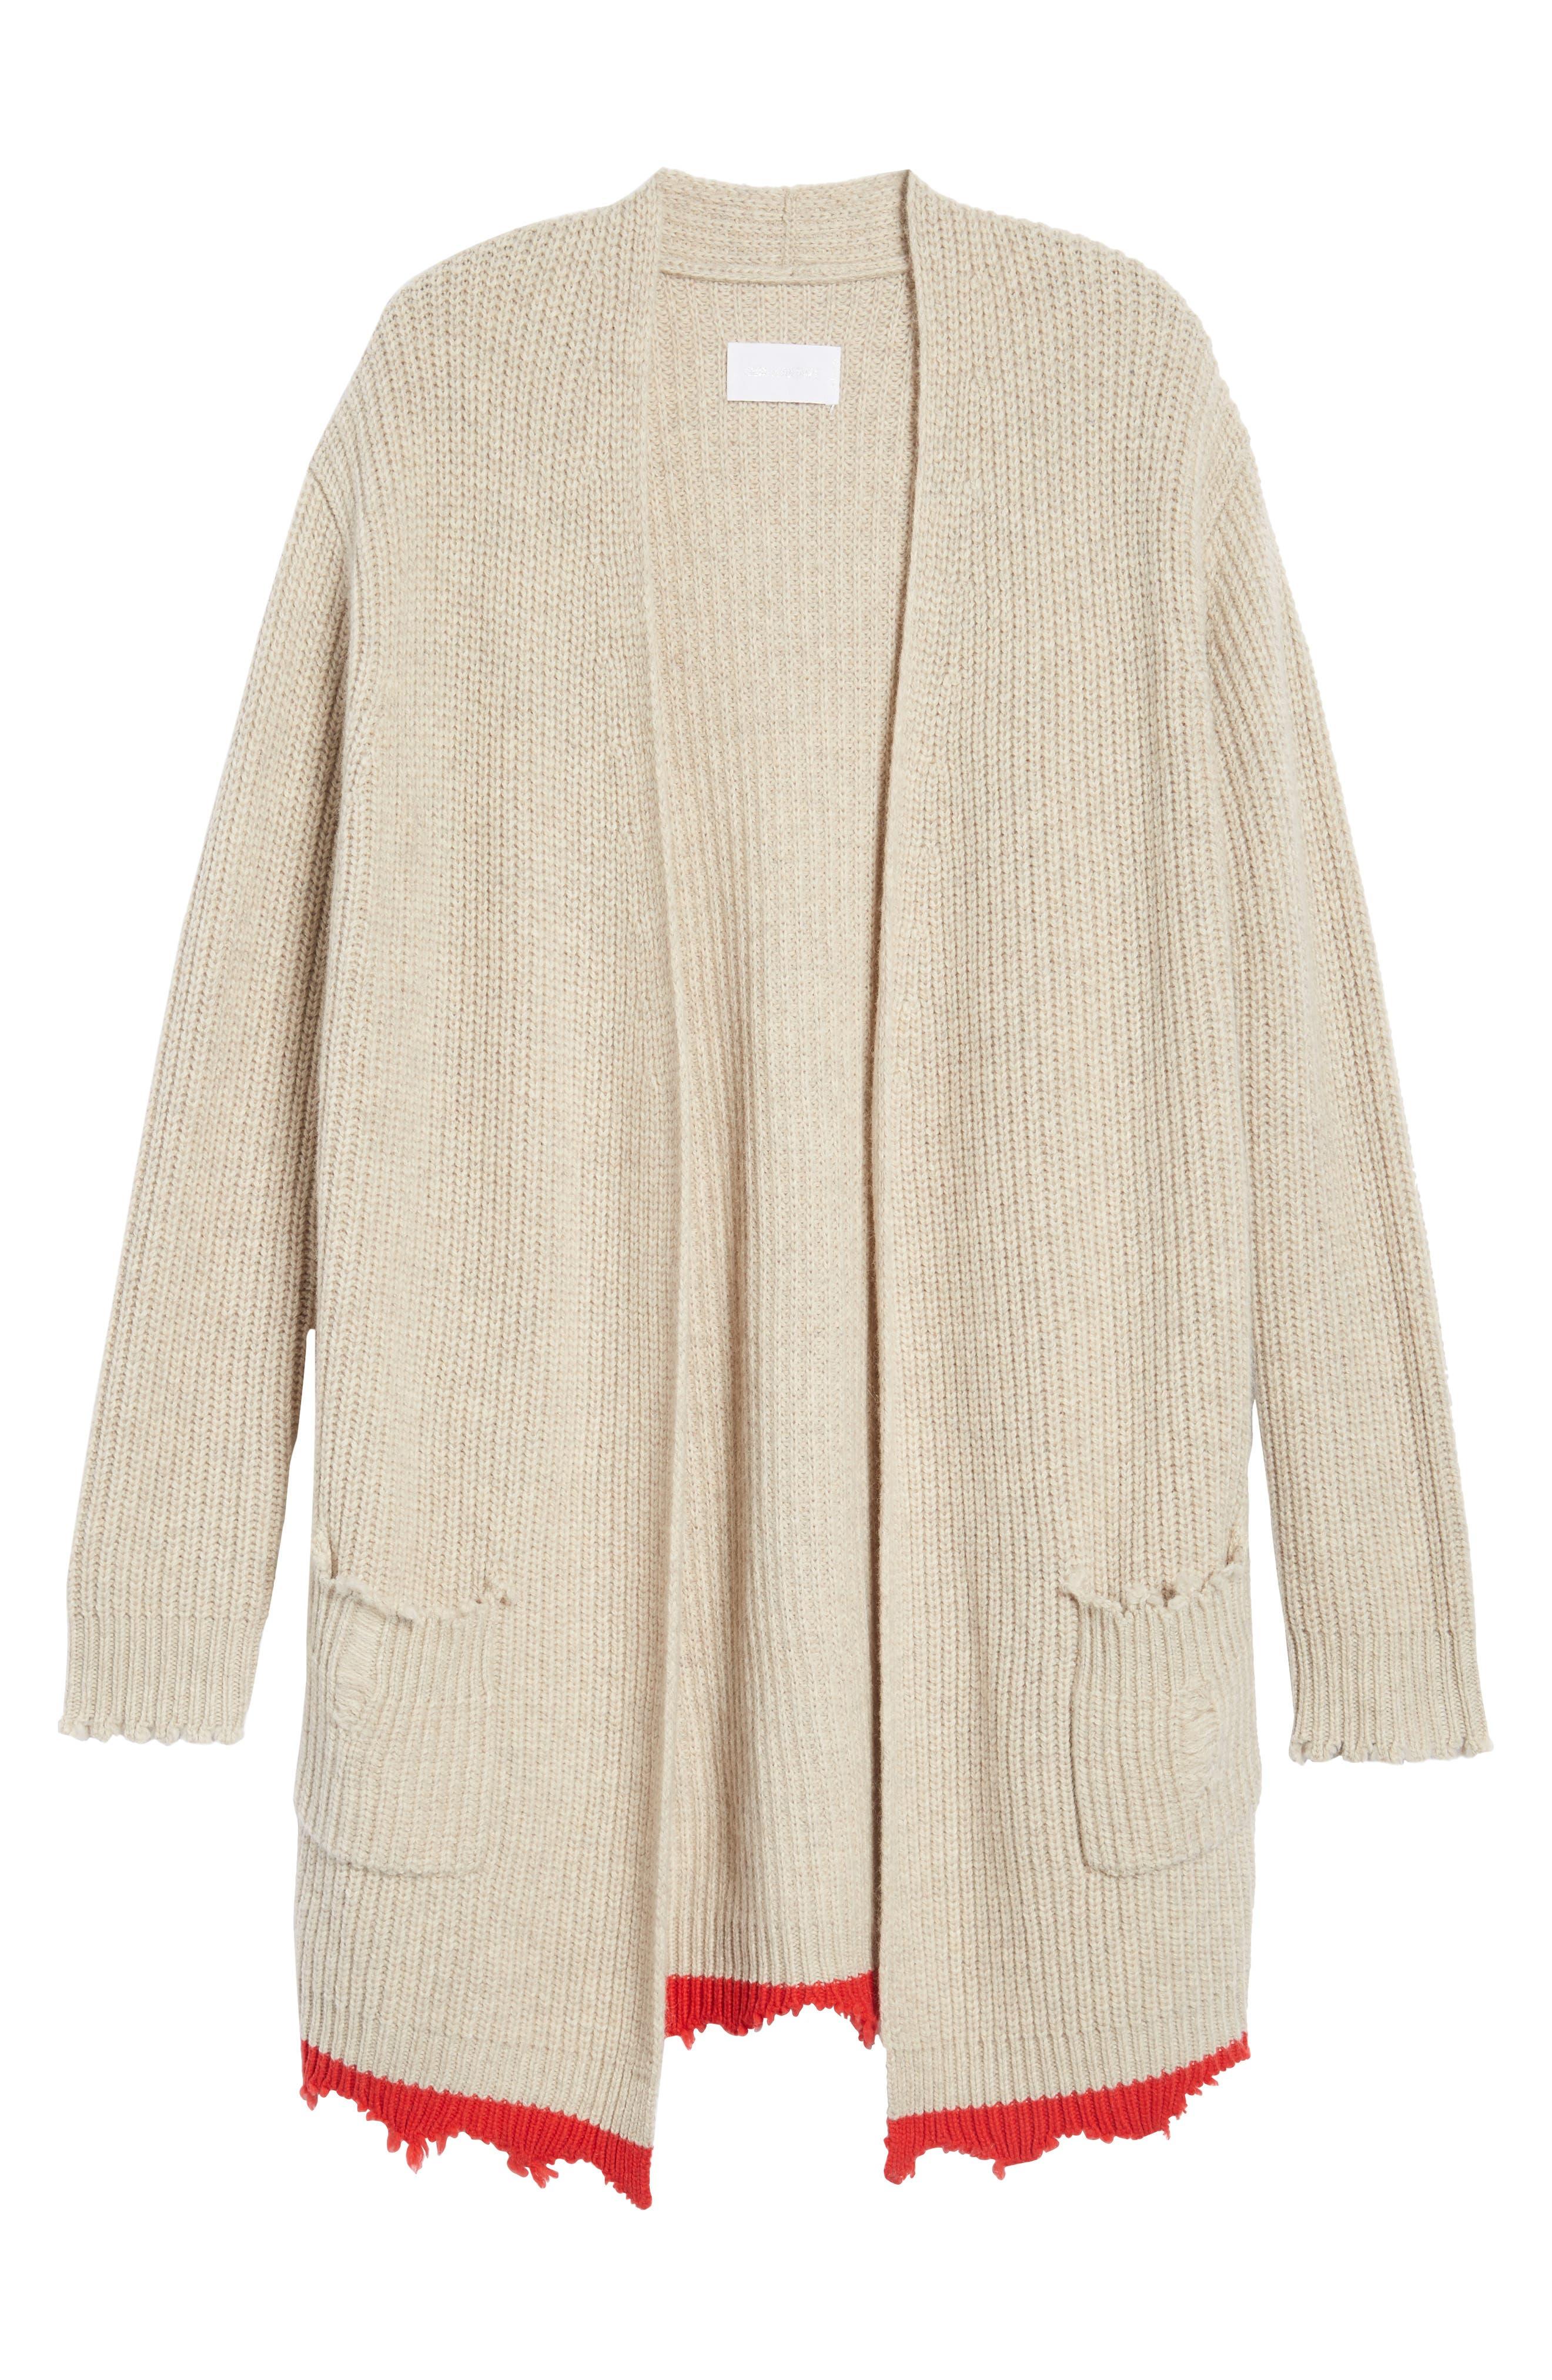 Rita Cardigan Sweater,                             Alternate thumbnail 6, color,